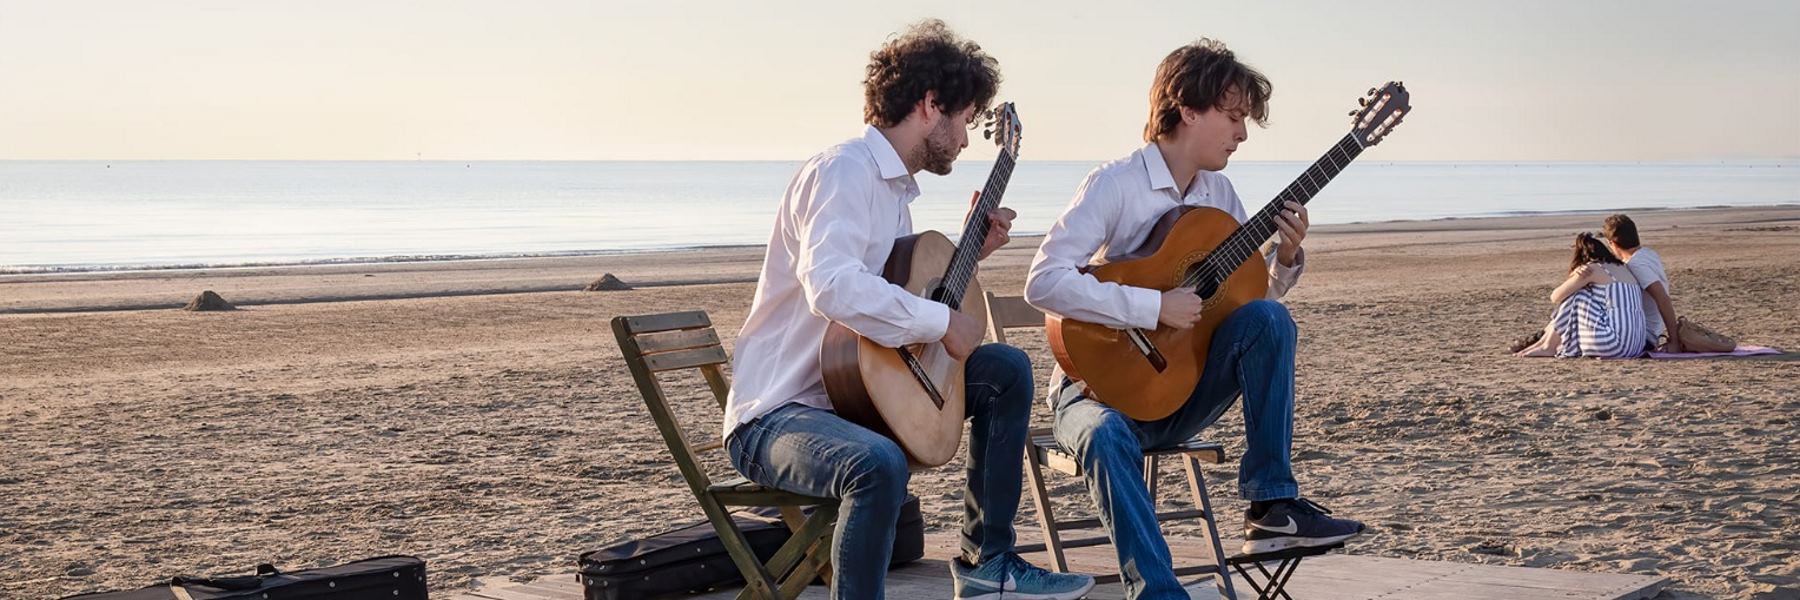 Albe musicali